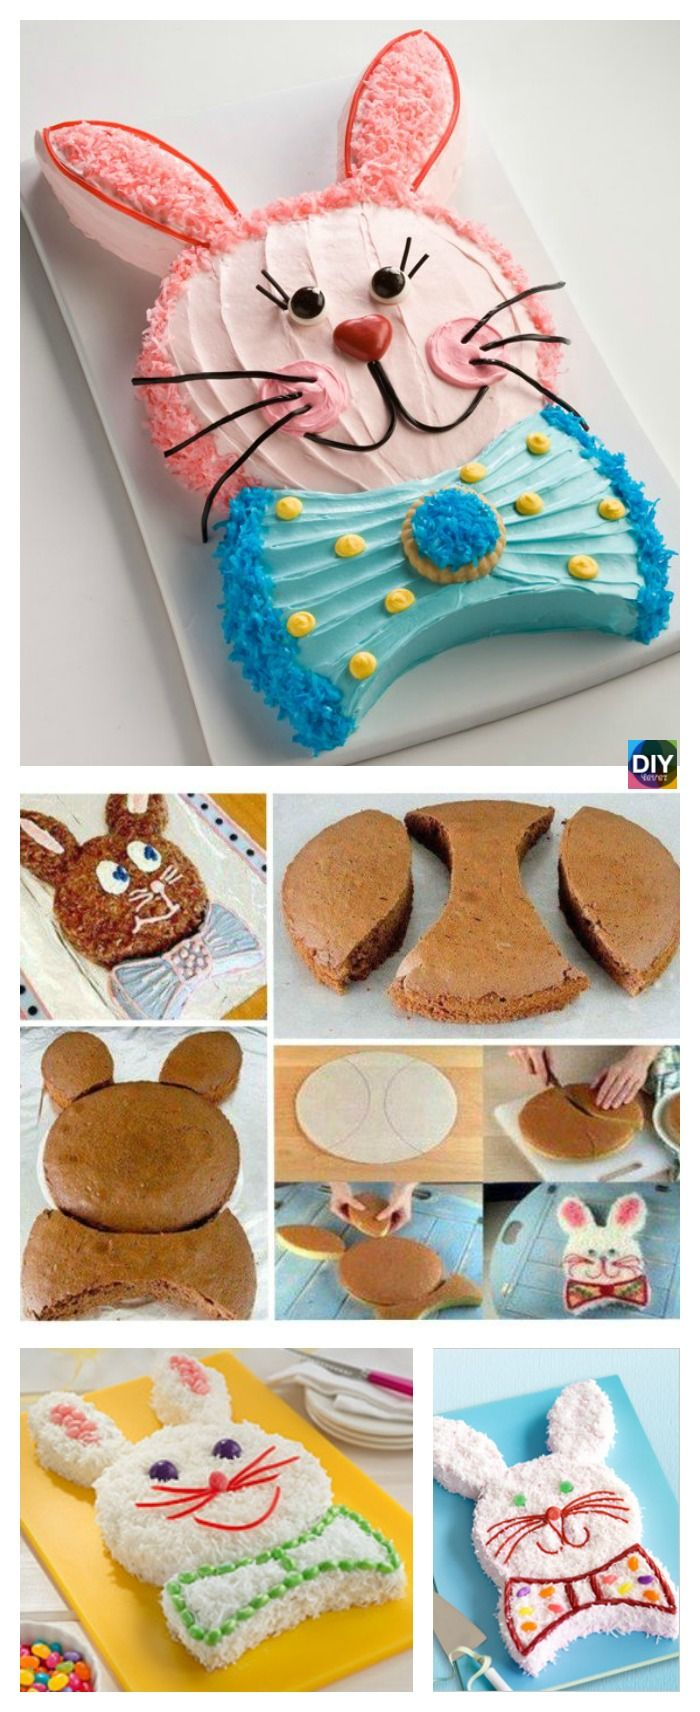 Easy Diy Easter Bunny Cake Tutorial Easter Bunny Cake Easter